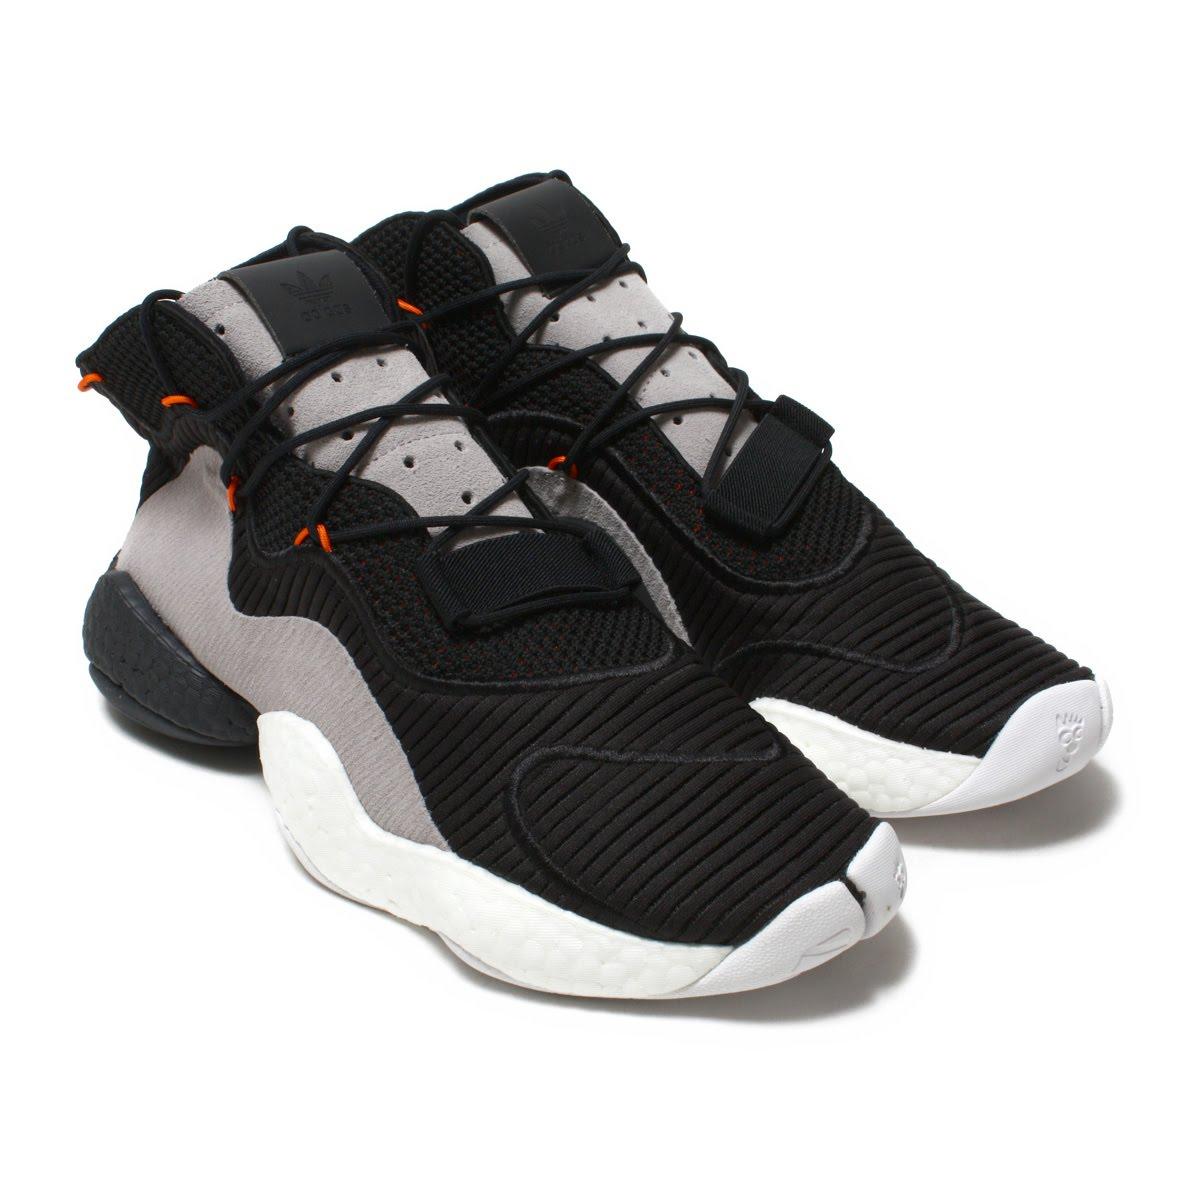 adidas Originals CRAZY BYW(アディダス オリジナルス クレイジー BYW)CORE BLACK/ORANGE/HI-RES RED【メンズ スニーカー】18FA-I